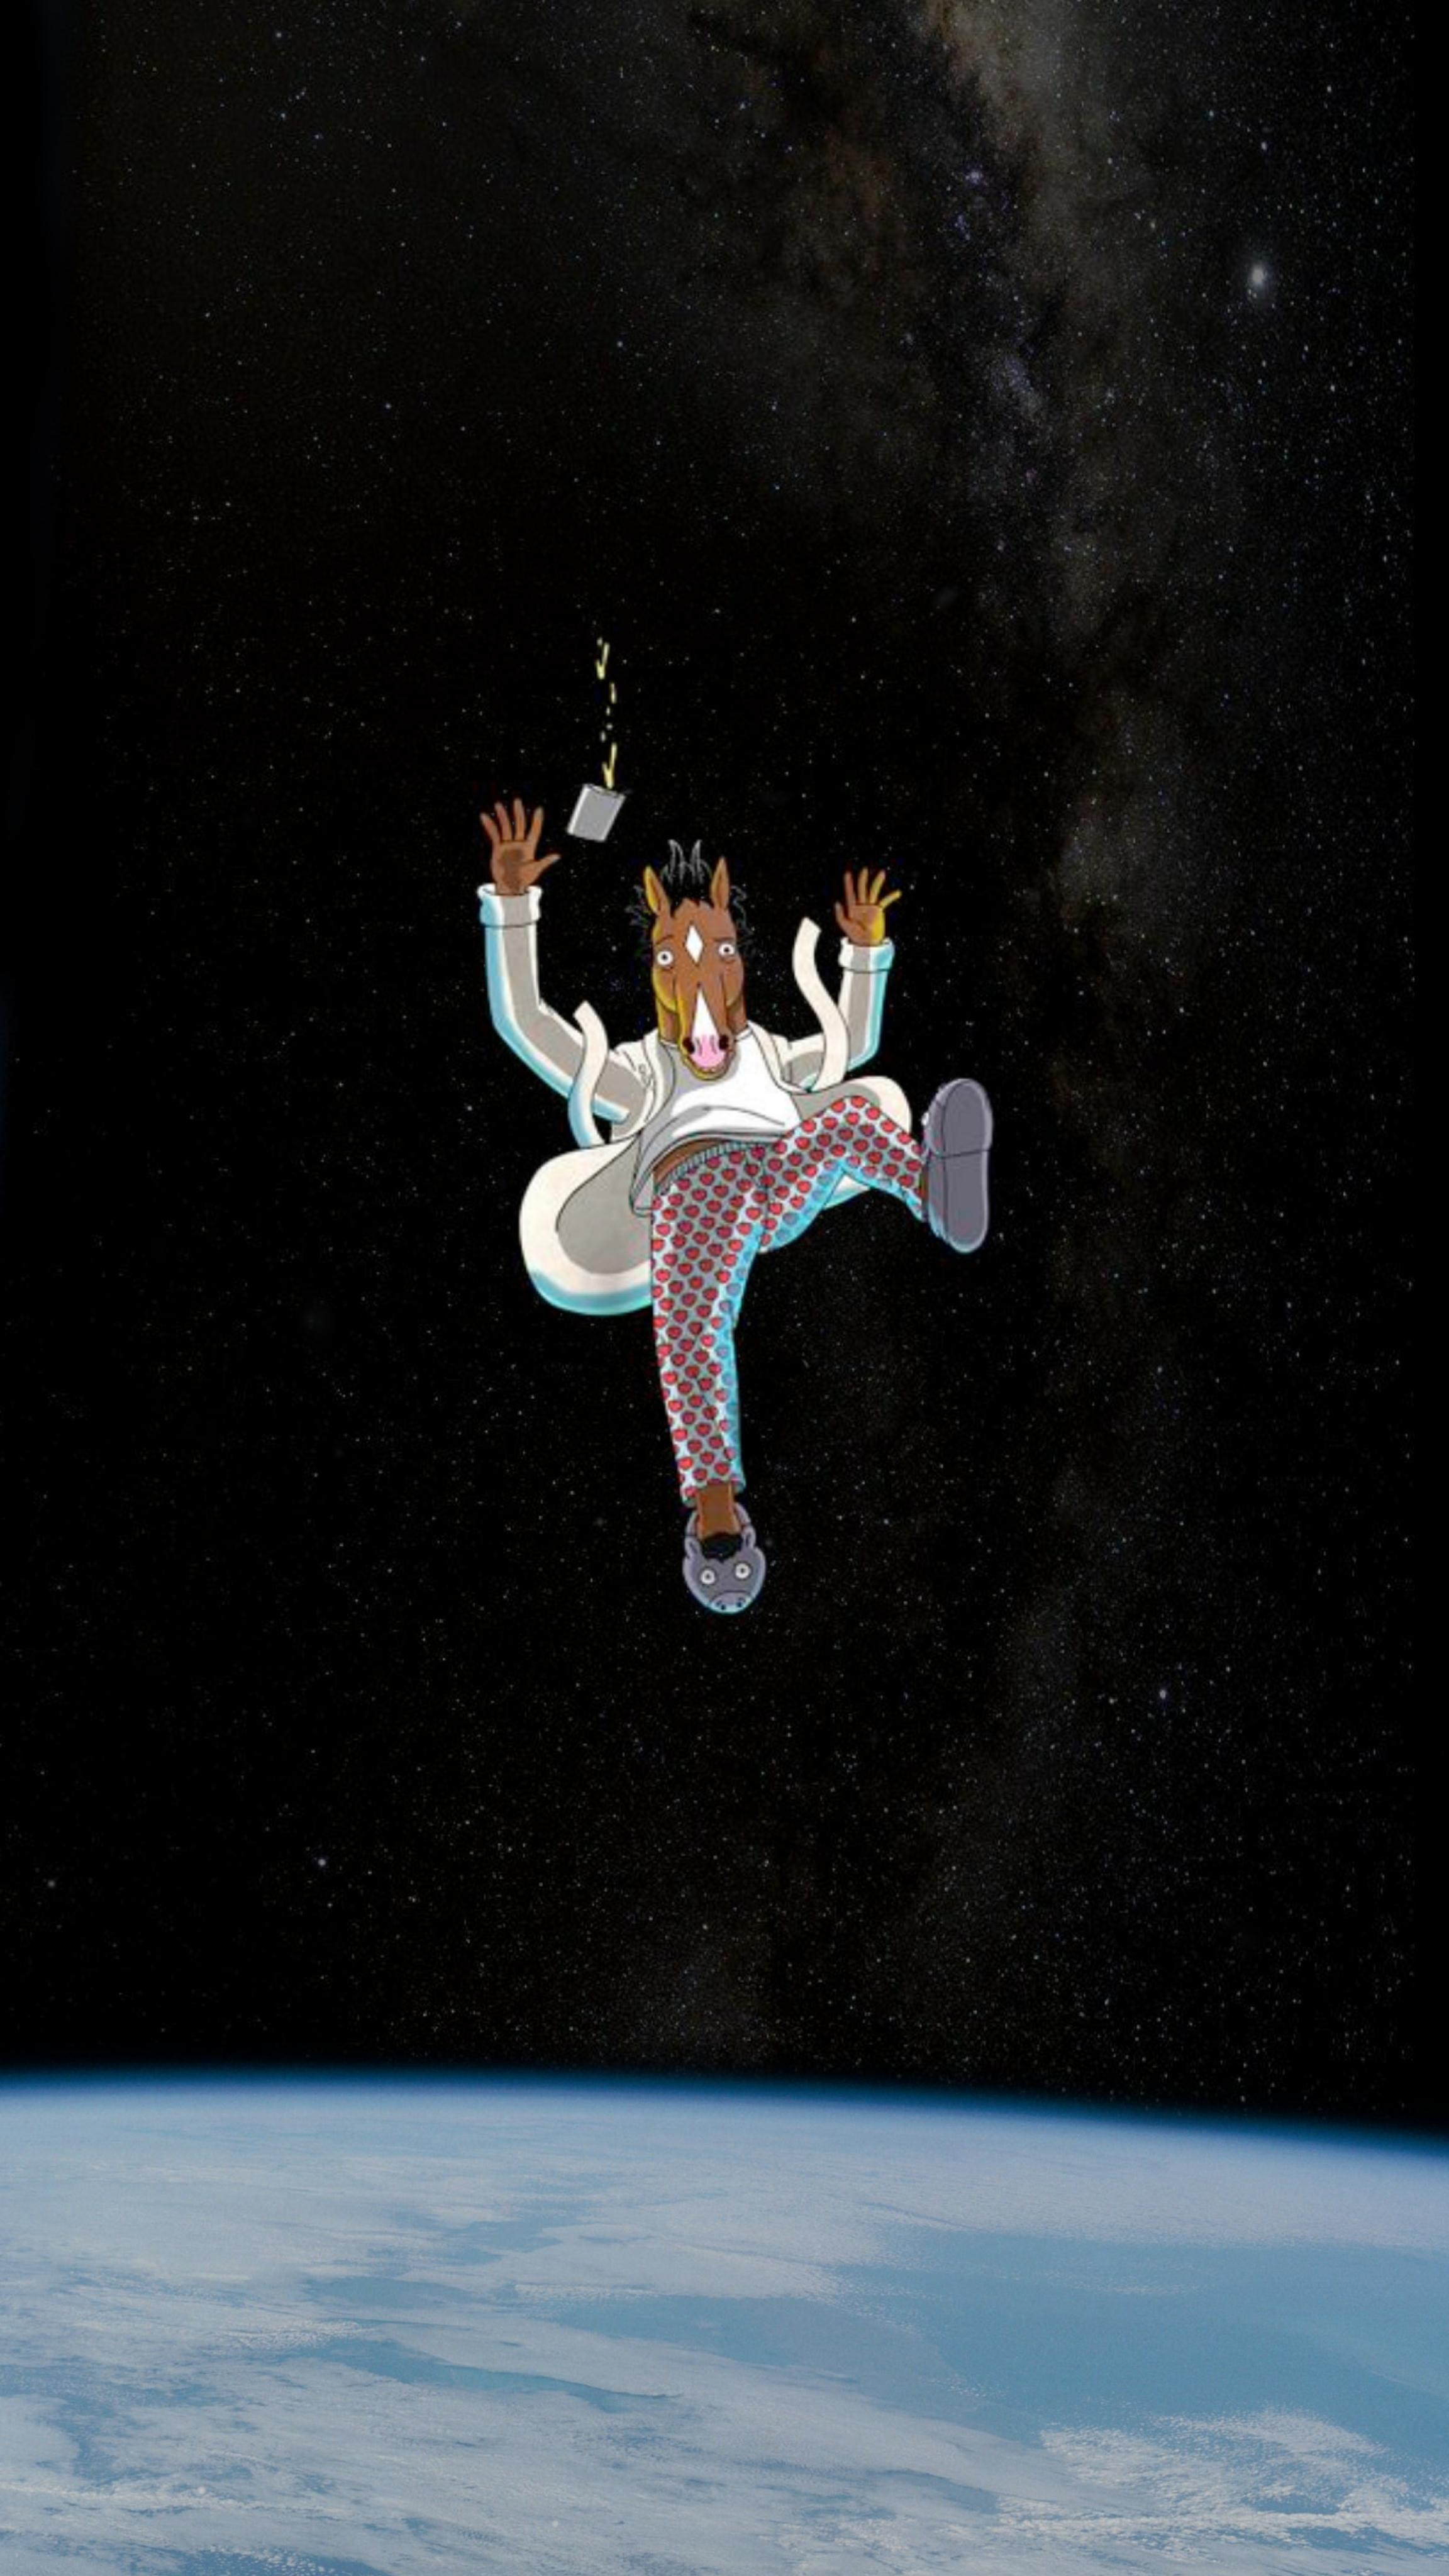 Falling Images Live Wallpaper Falling Wallpaper Bojackhorseman